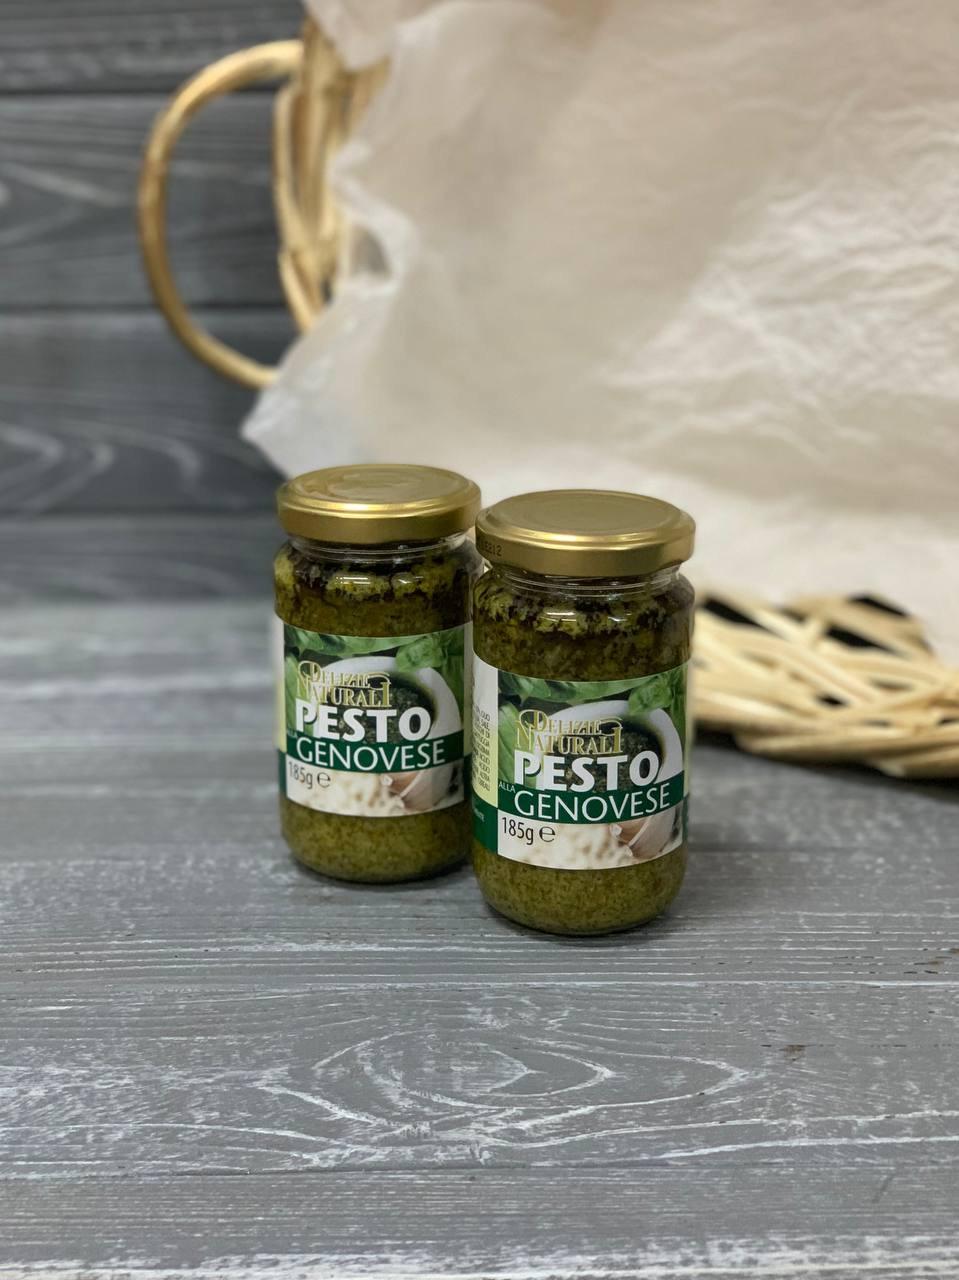 Соус песто Pesto genovese 185g